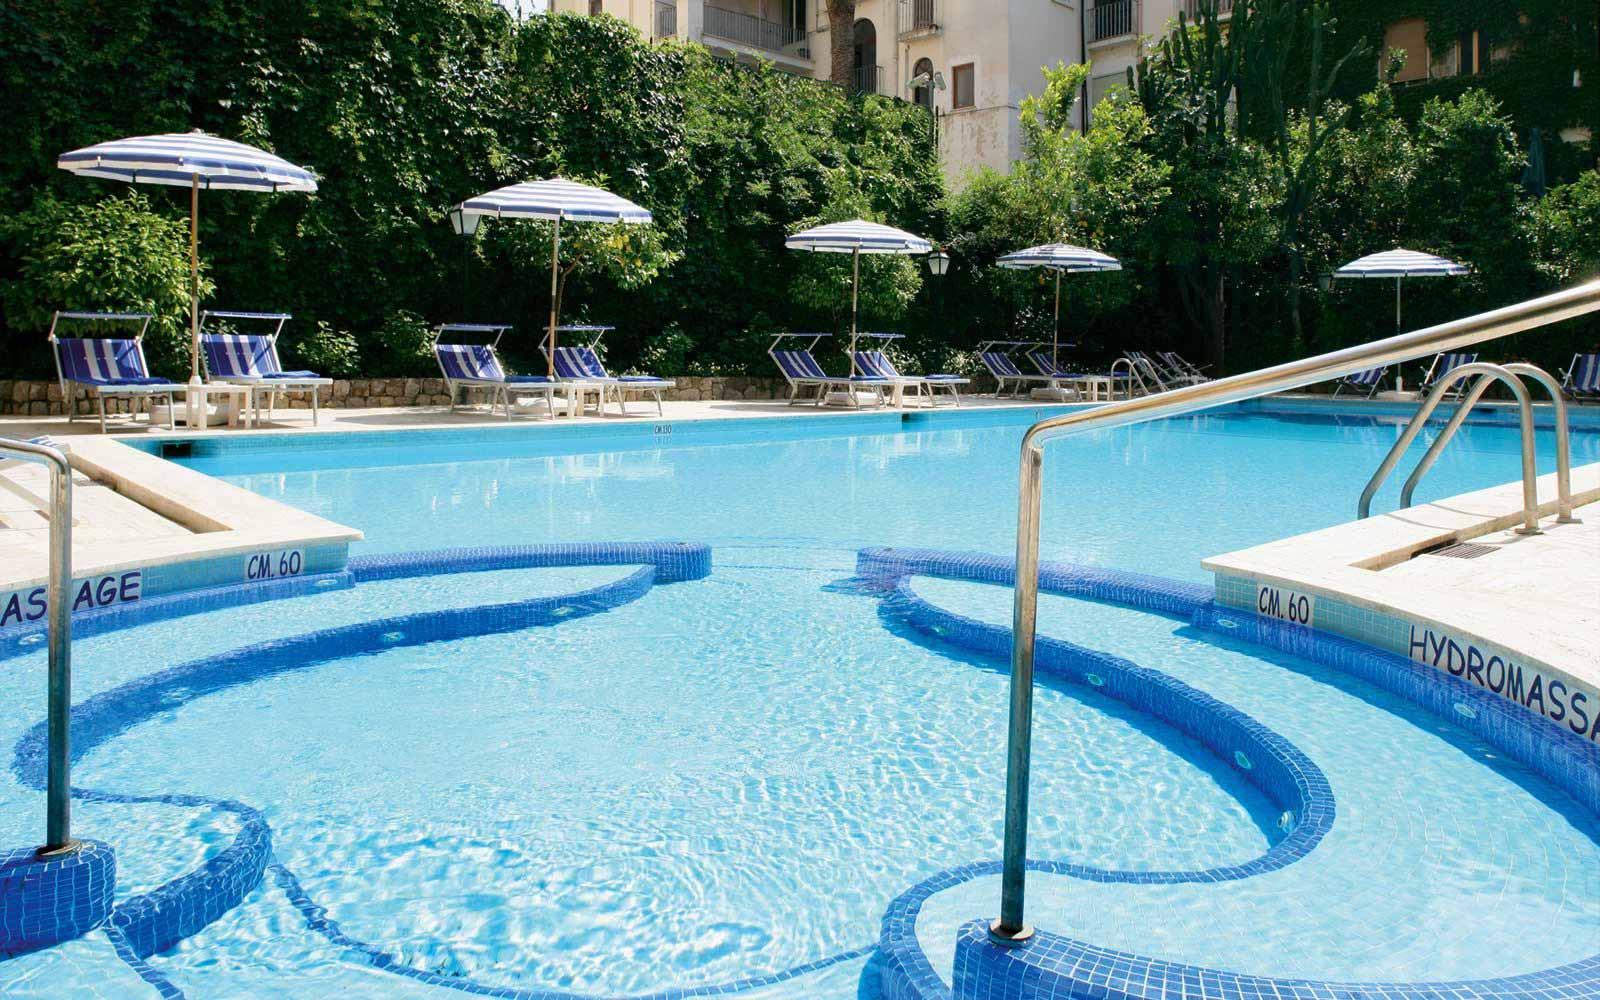 Main pool at Grand Hotel de la Ville